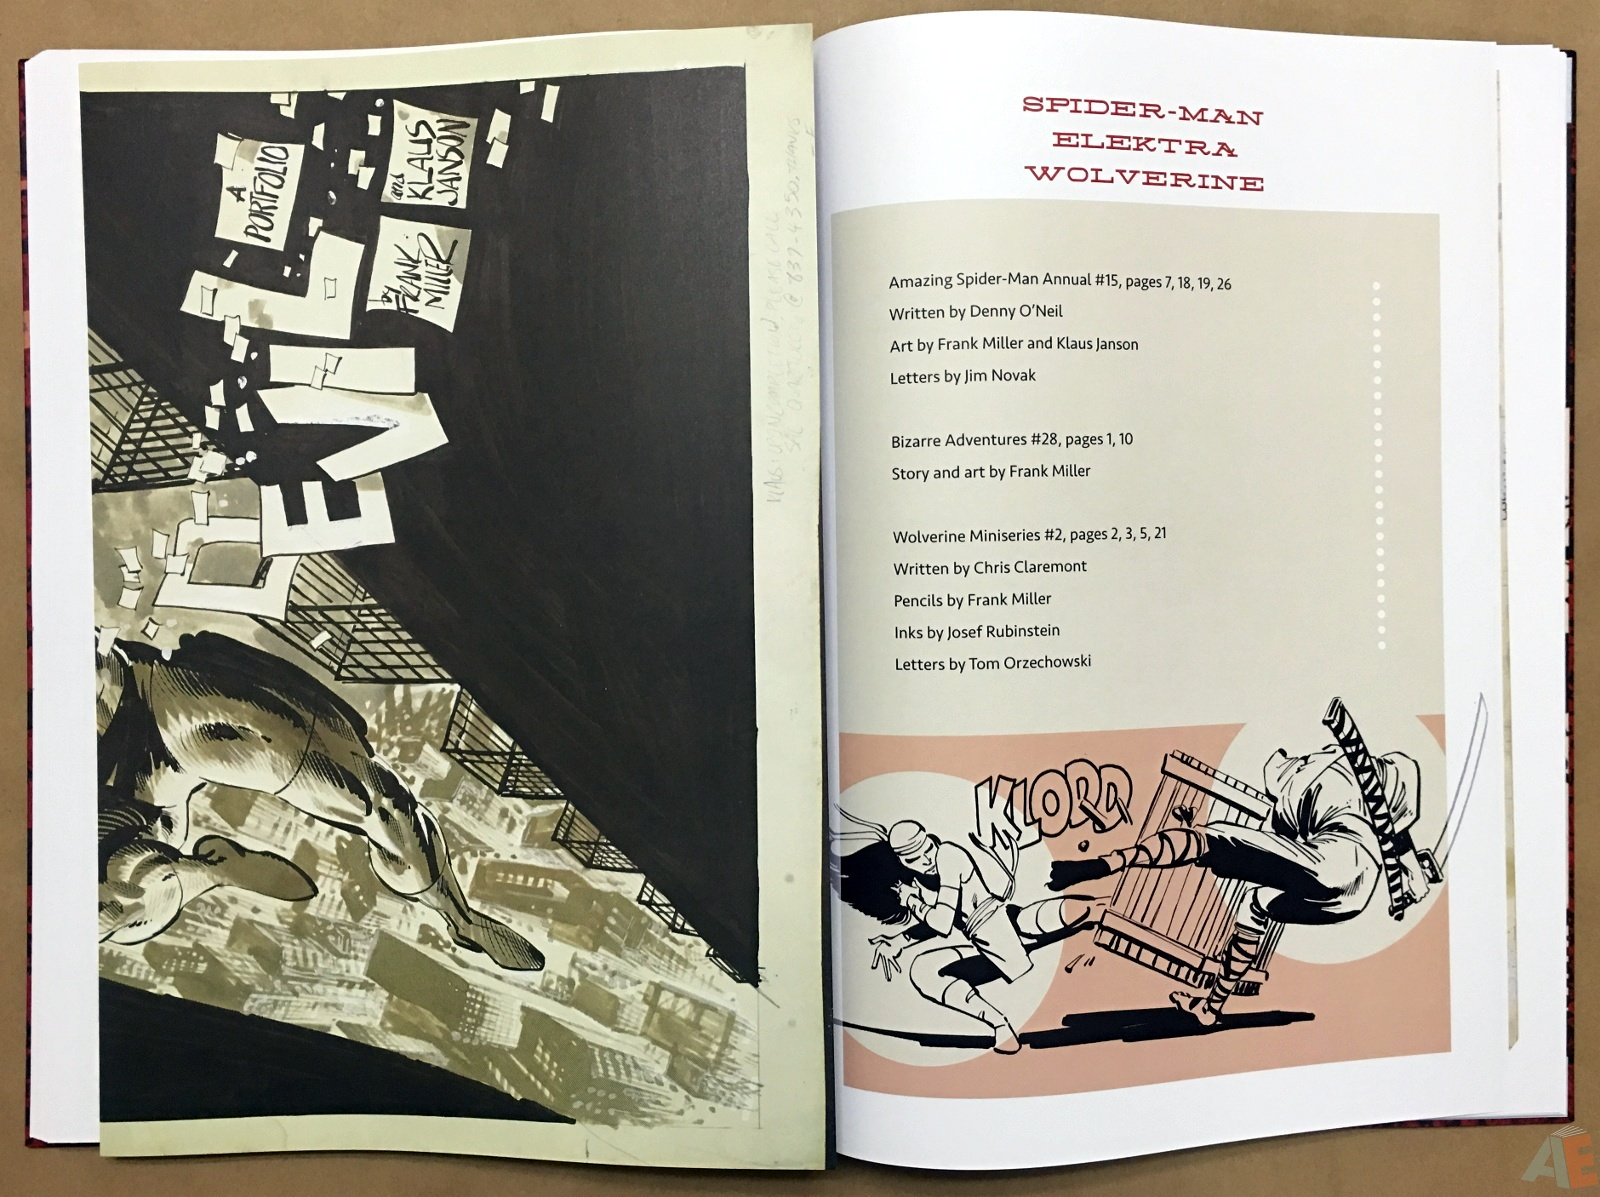 Frank Miller's Daredevil Artifact Edition 31